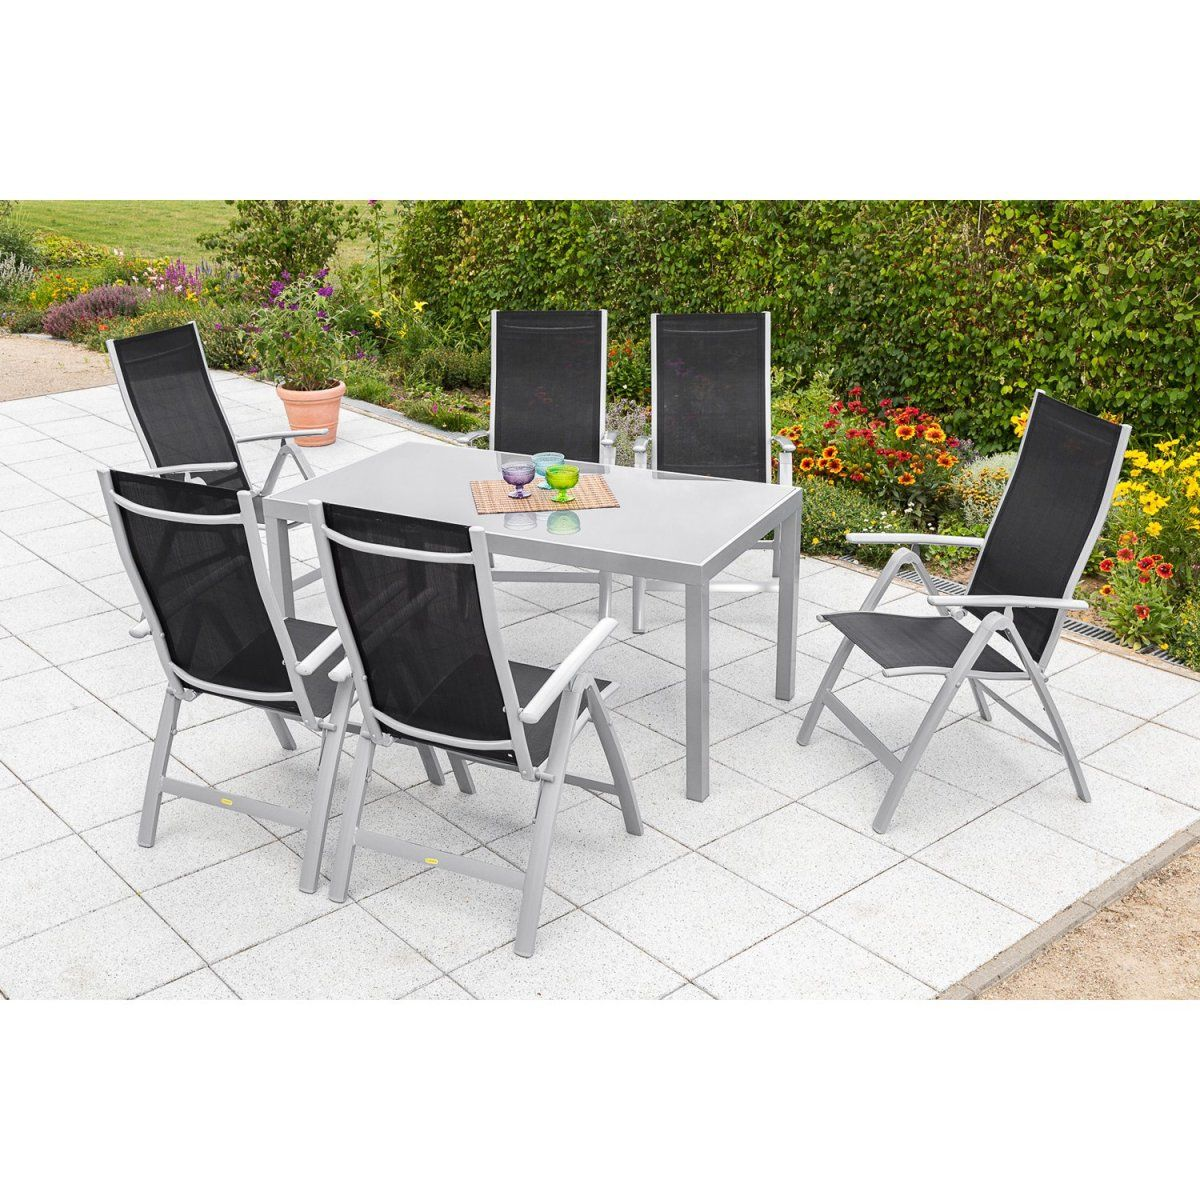 Gartenmöbel-Set Carrara 7-tlg. Schwarz inkl. Tisch 150 cm x 90 cm ...